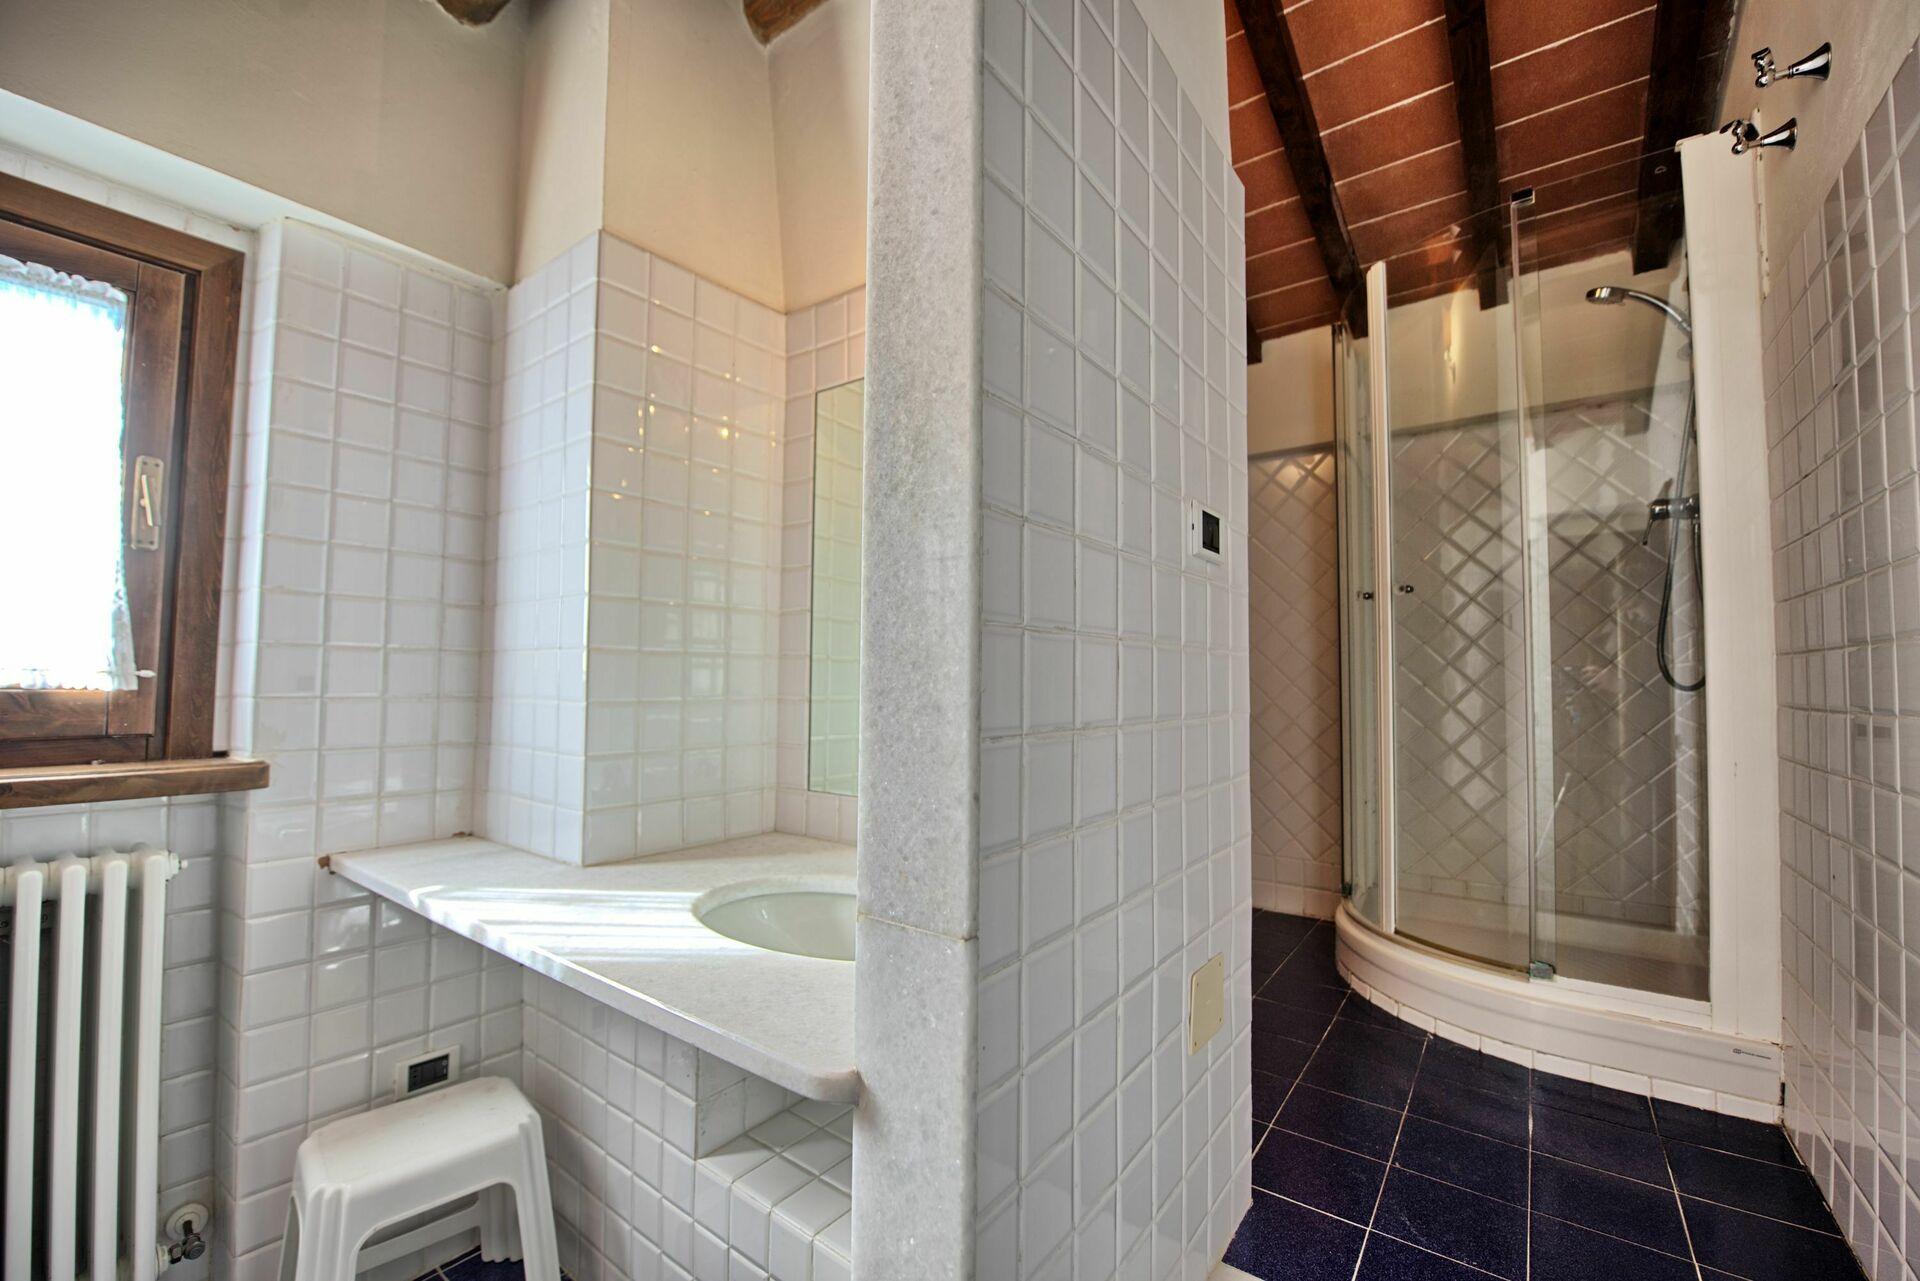 Montegufoni 34 | Schloss-appartment in Montegufoni Toskana - 4 ...